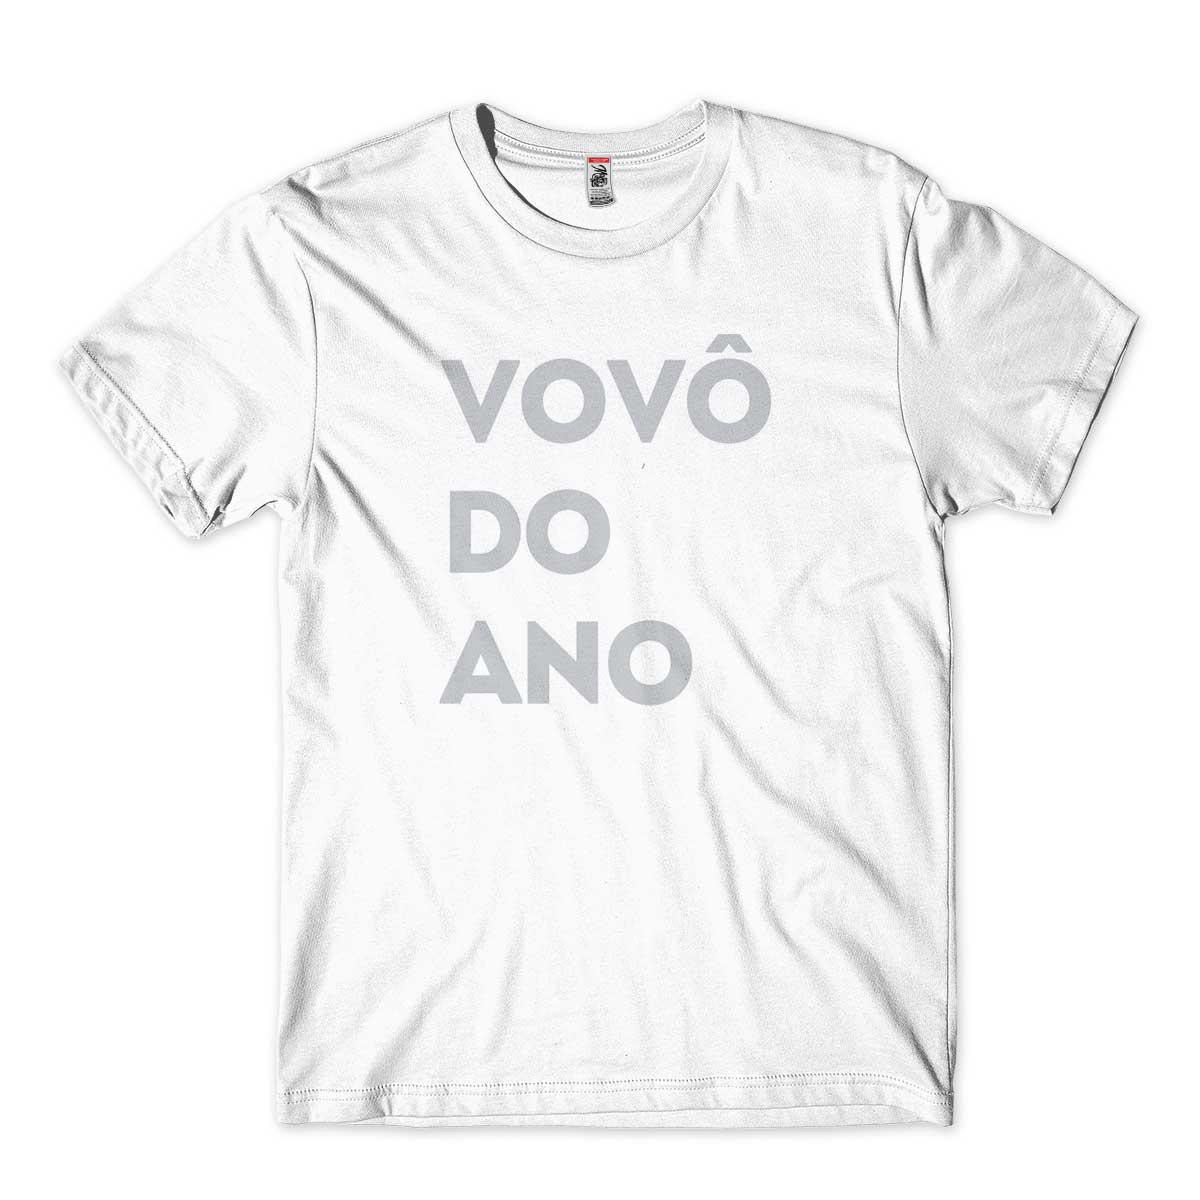 Camiseta ideia de presente para avô aniversario personalizado